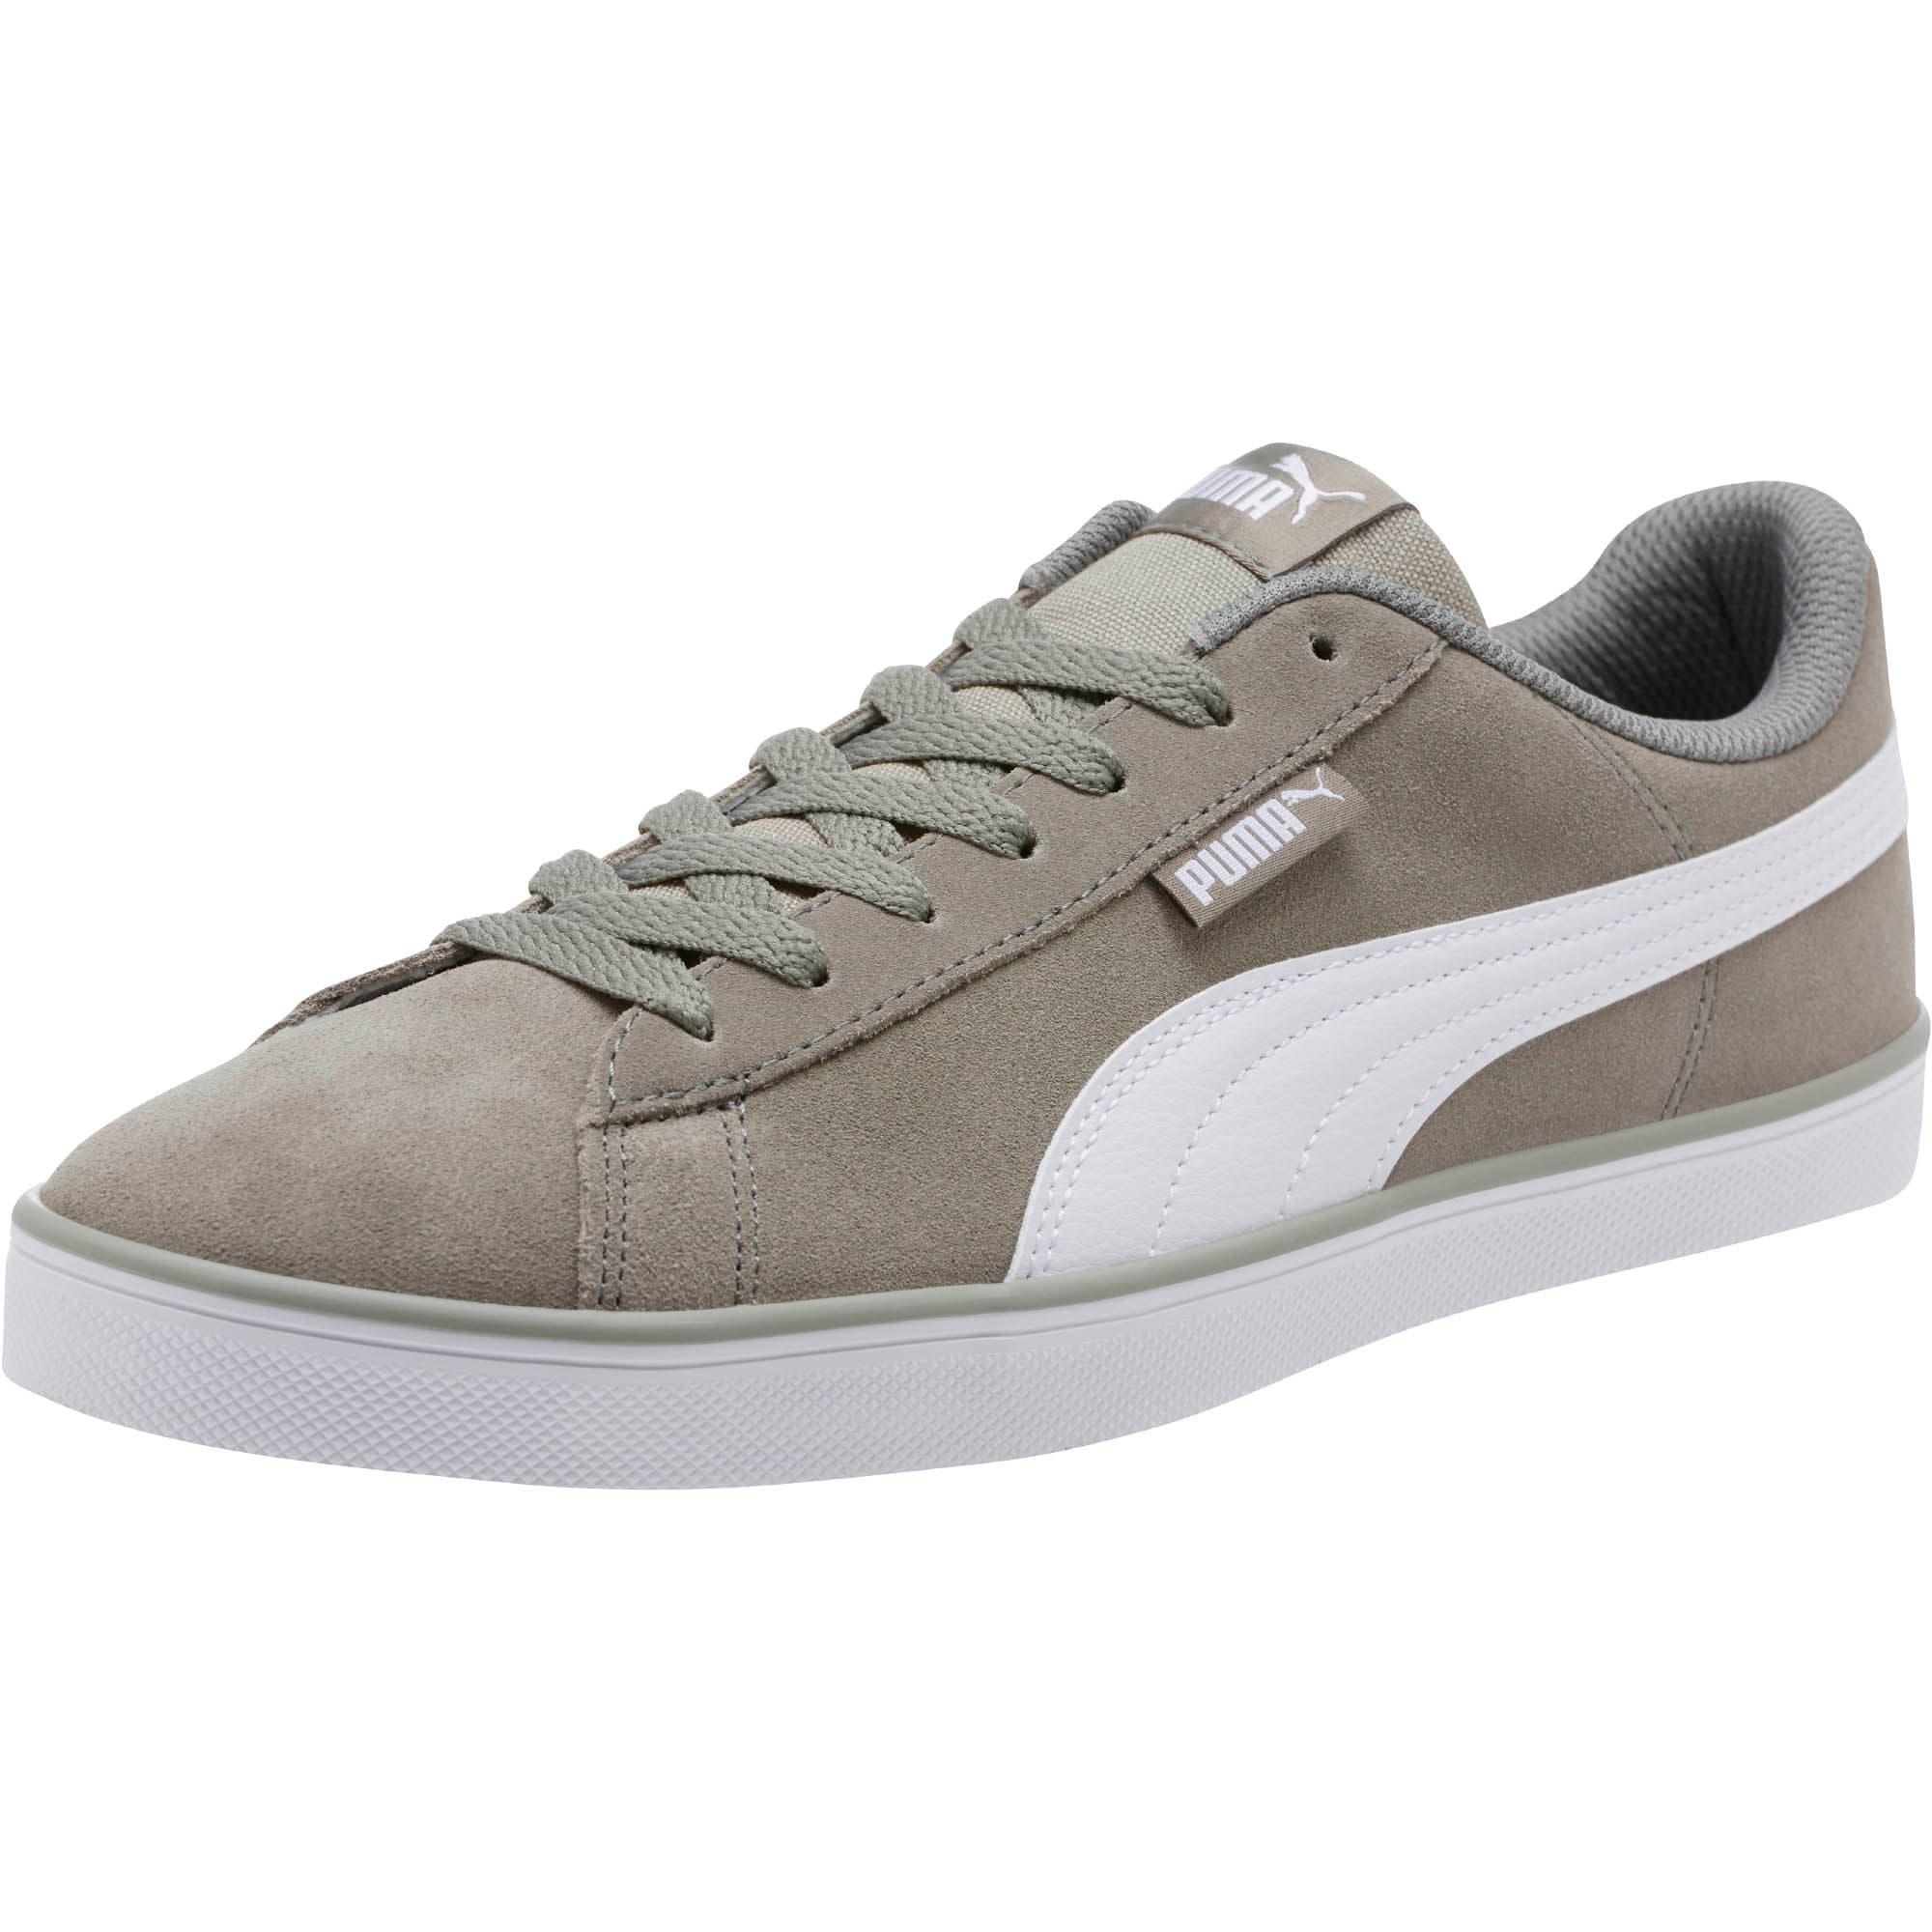 Thumbnail 1 of Urban Plus Suede Sneakers, Rock Ridge-Puma White, medium